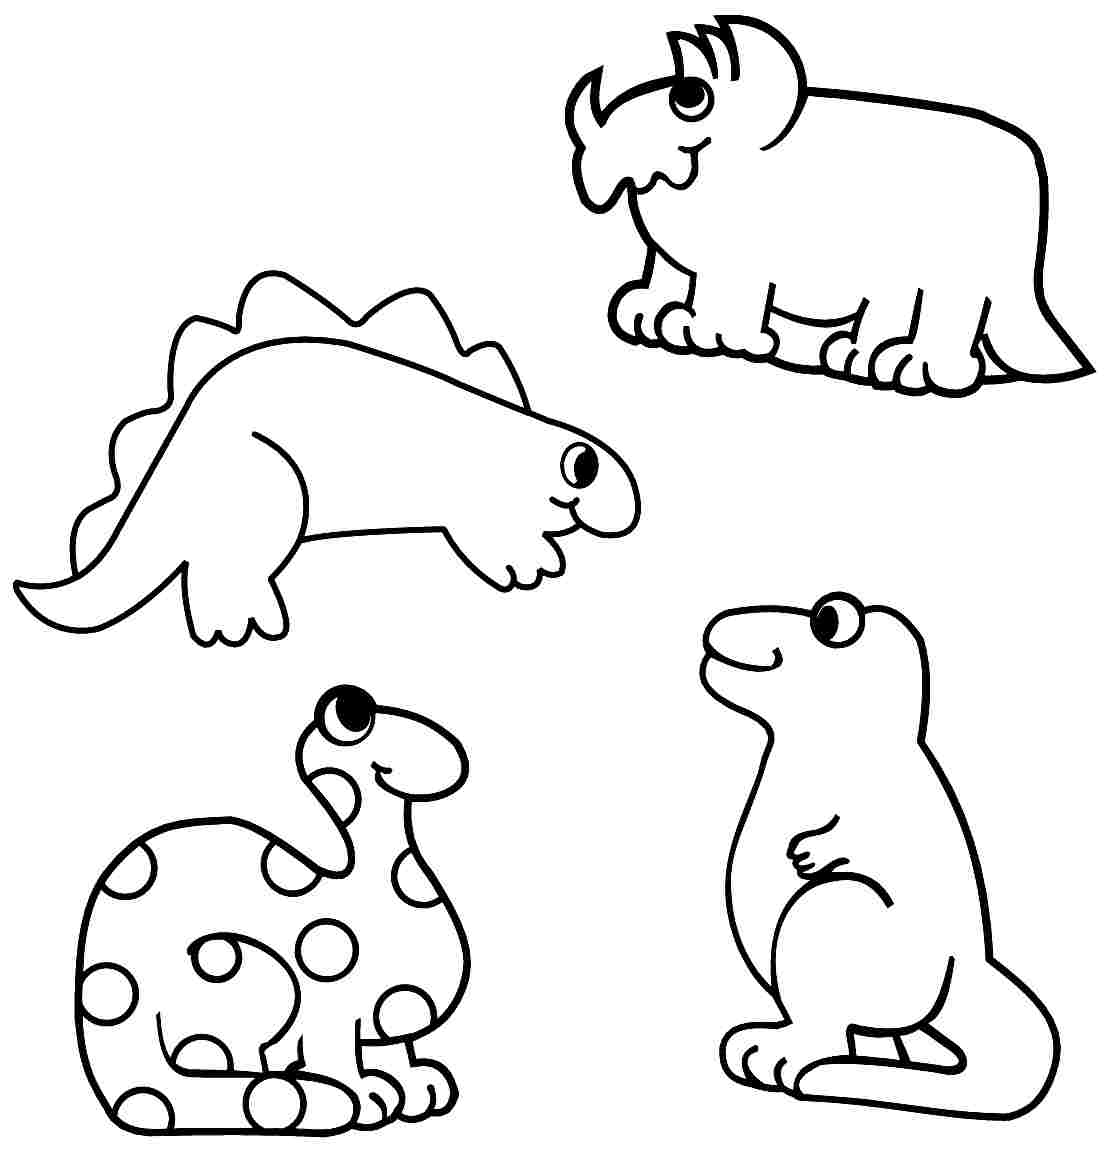 Dinosaur Coloring Pages Preschool At Getcolorings